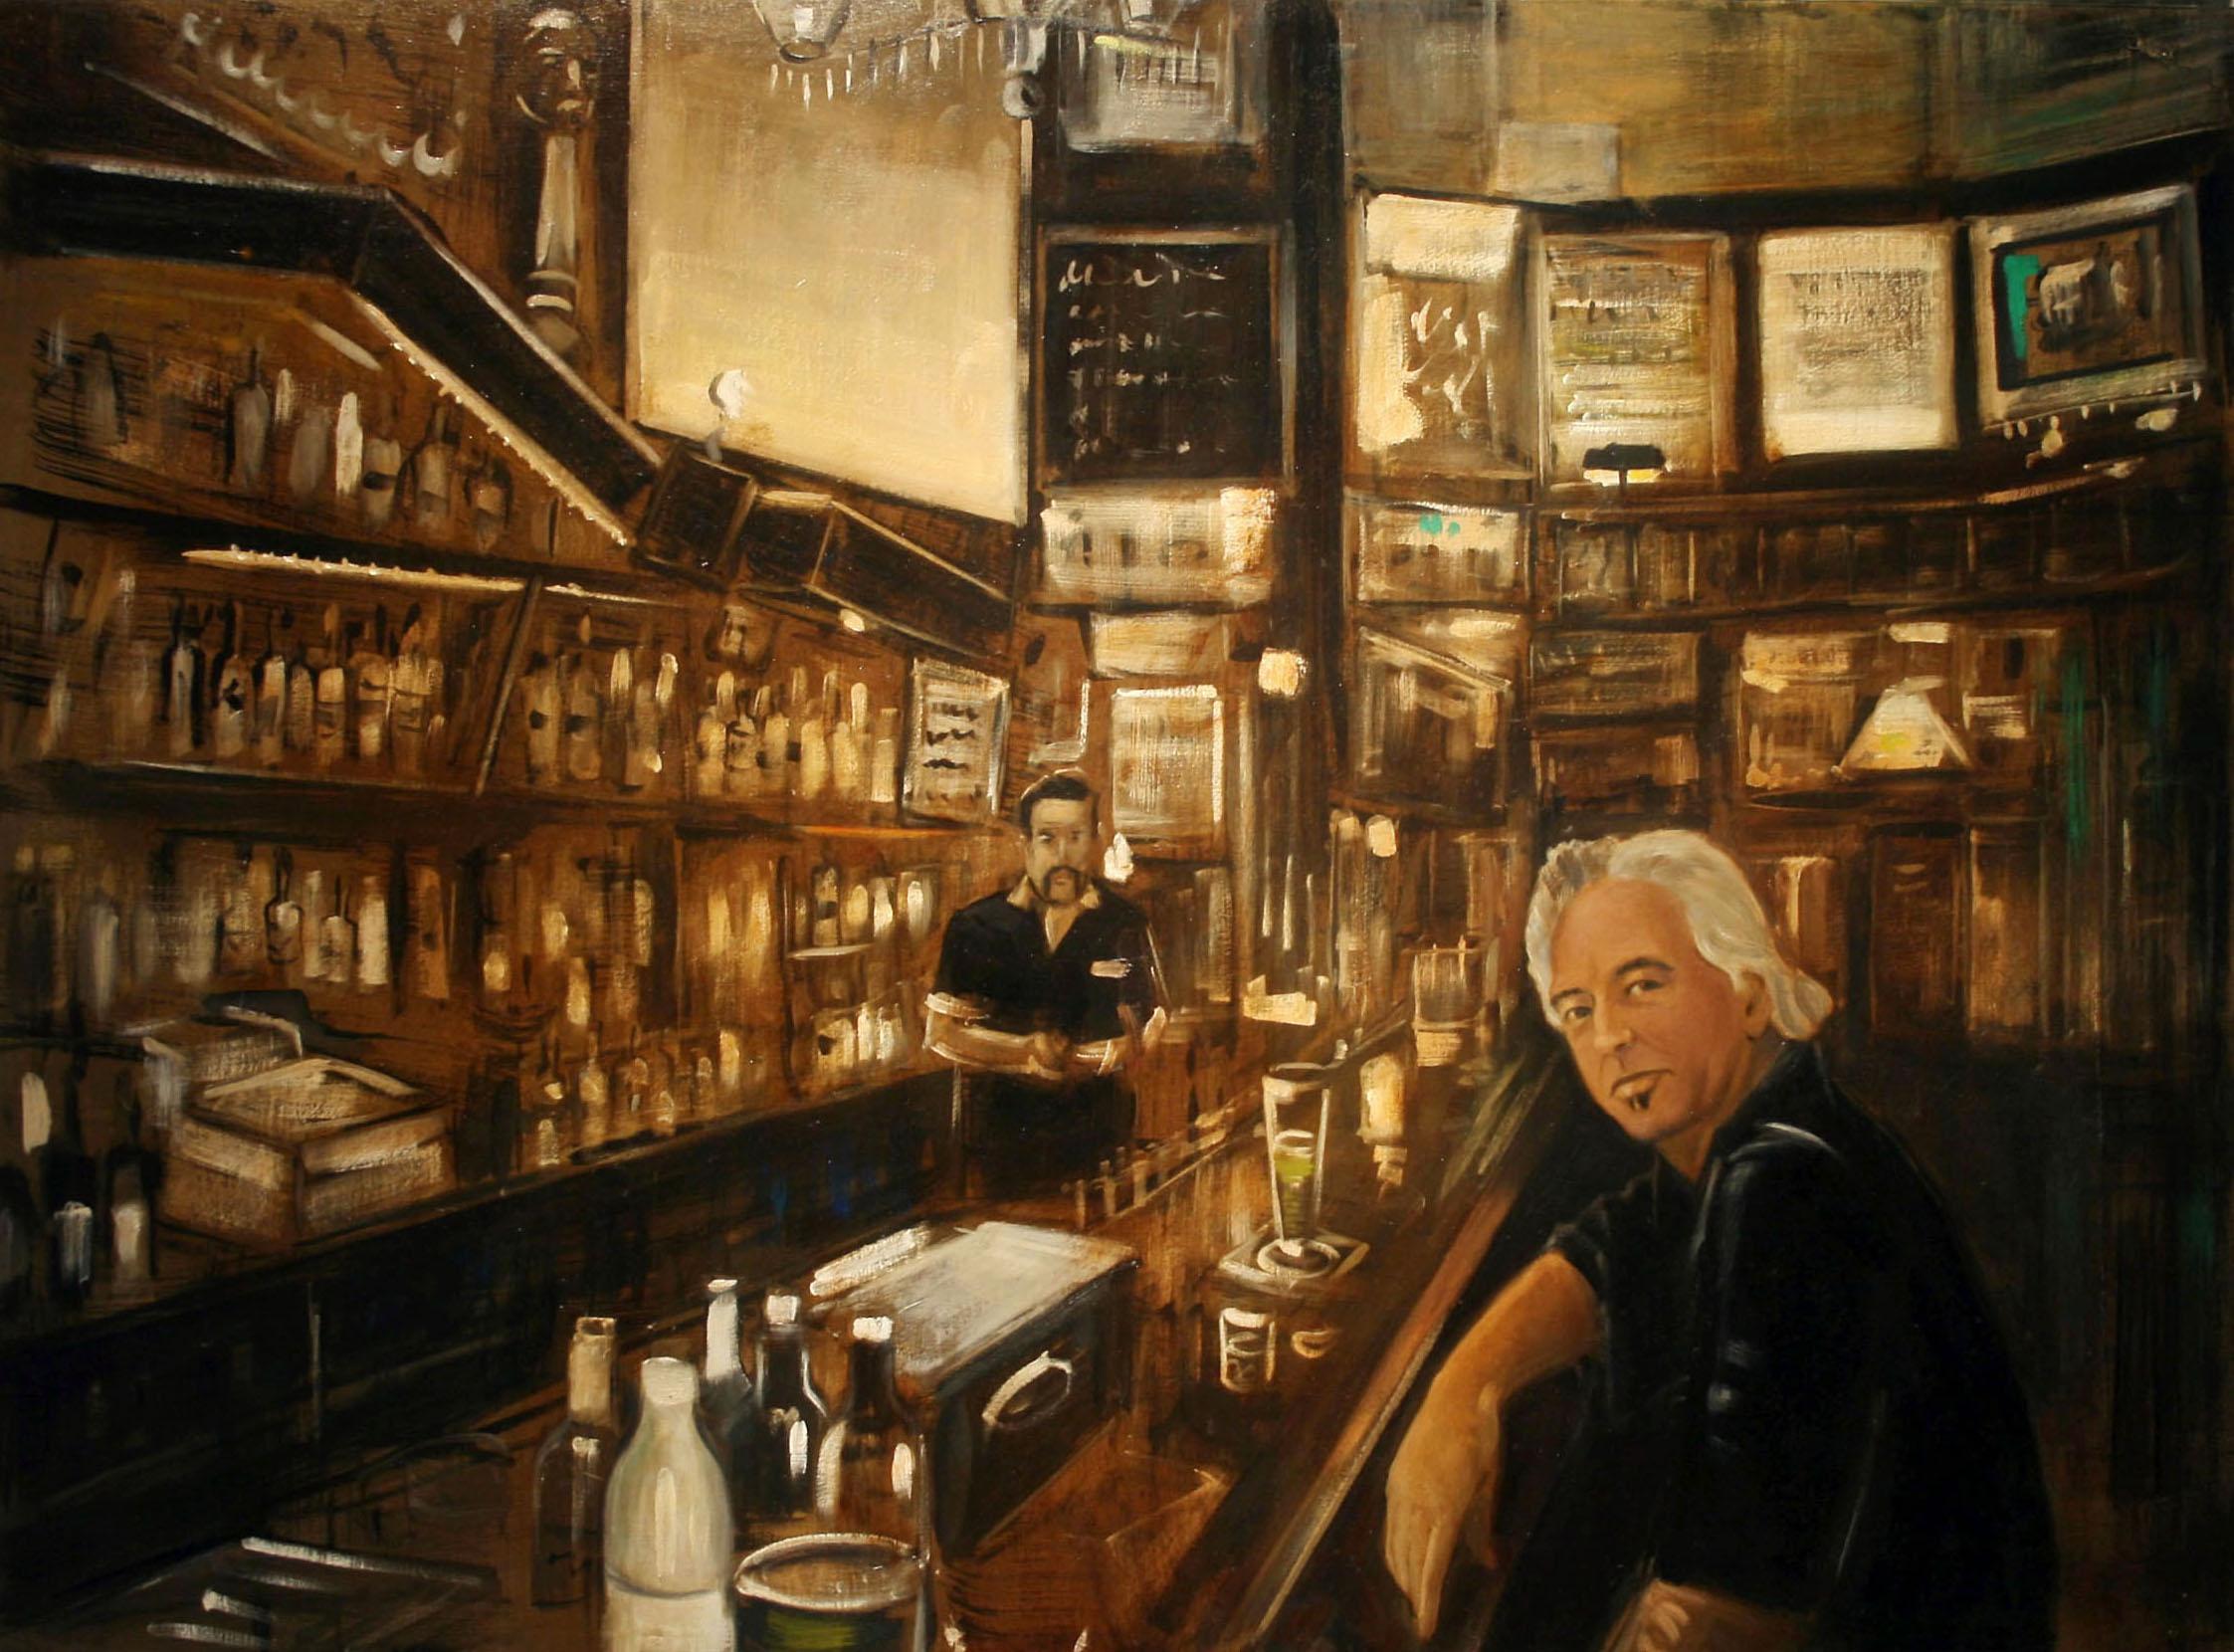 Raul Guerrero  Allen Ruppersberg c. 1999: Vesuvio Café, San Francisco, 2014 Oil on linen 34 x 46 inches (142.2 x 203.2 centimeters)